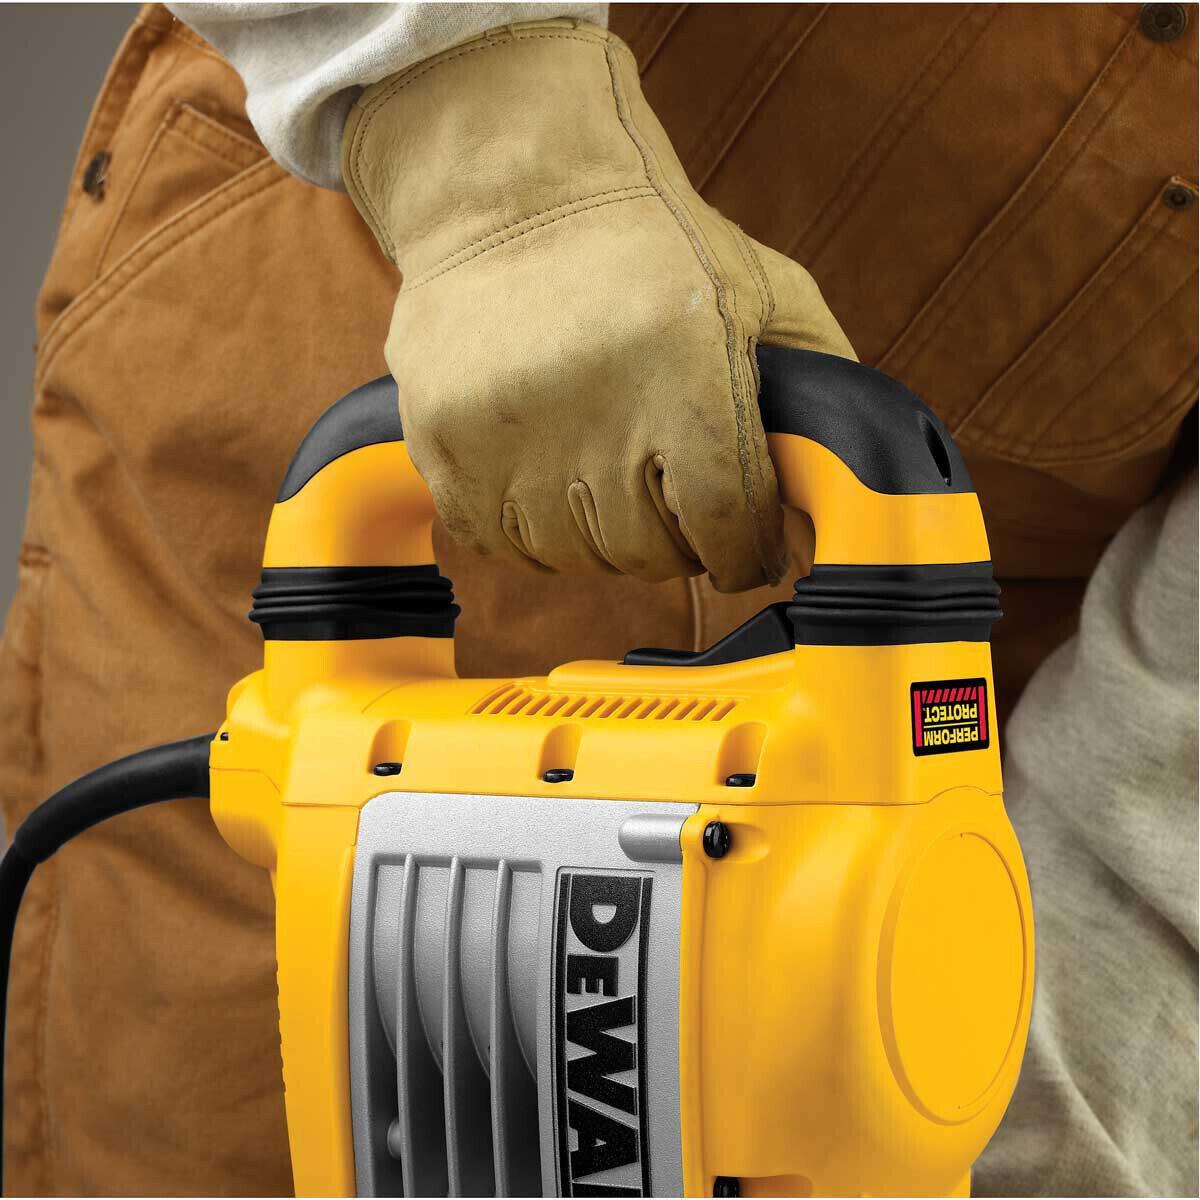 Operating a Dewalt D25901K Heavy Duty Demolition Hammer